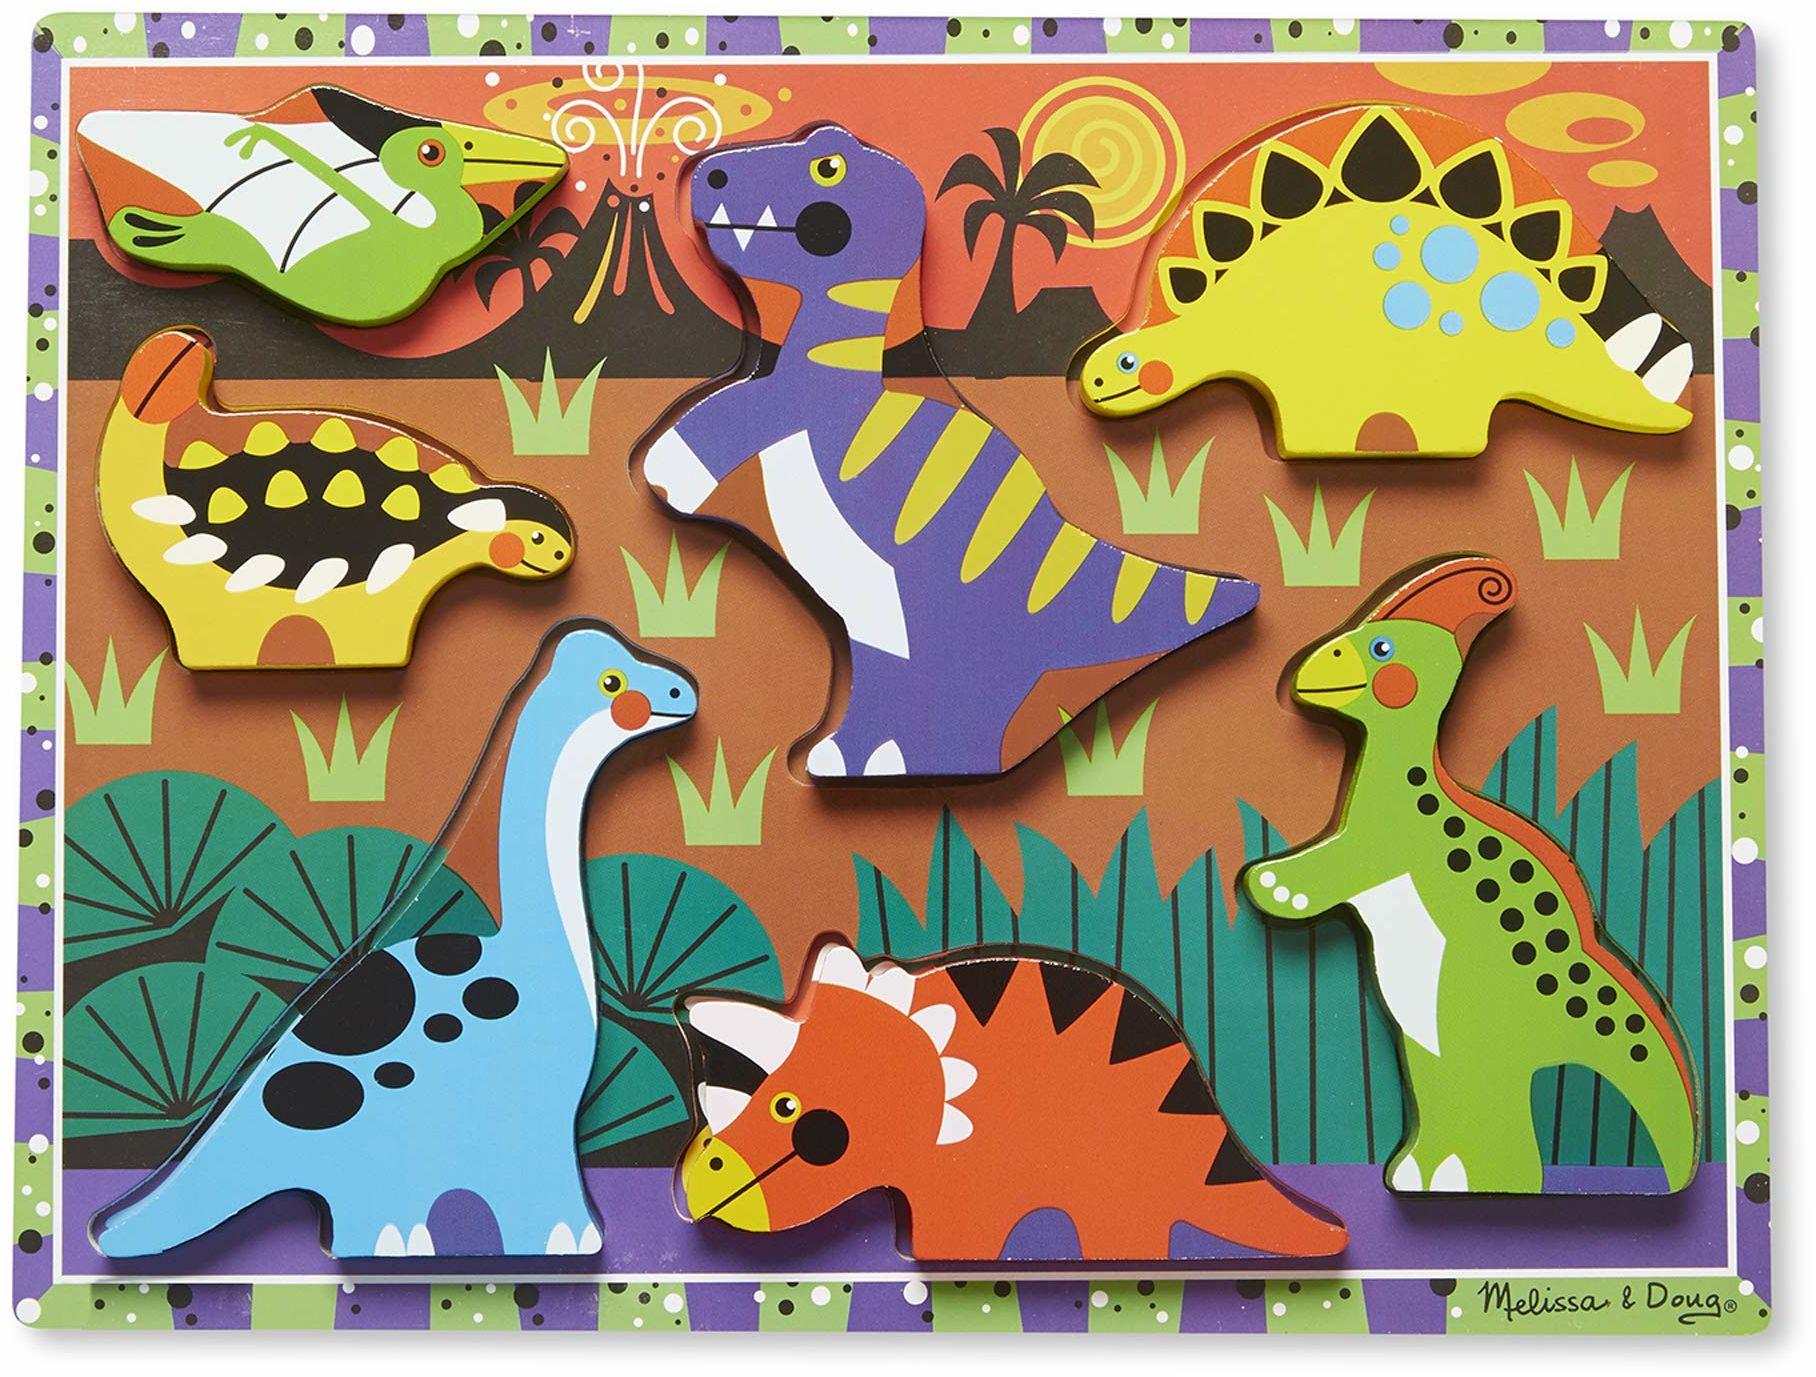 Melissa & Doug 13747 Doug dinozaury grube puzzle